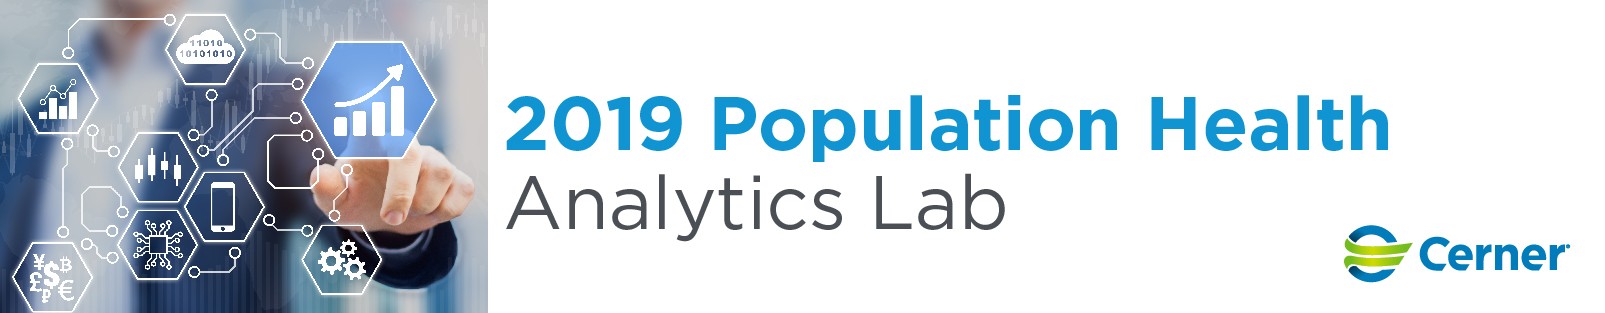 Population Health Analytics Lab